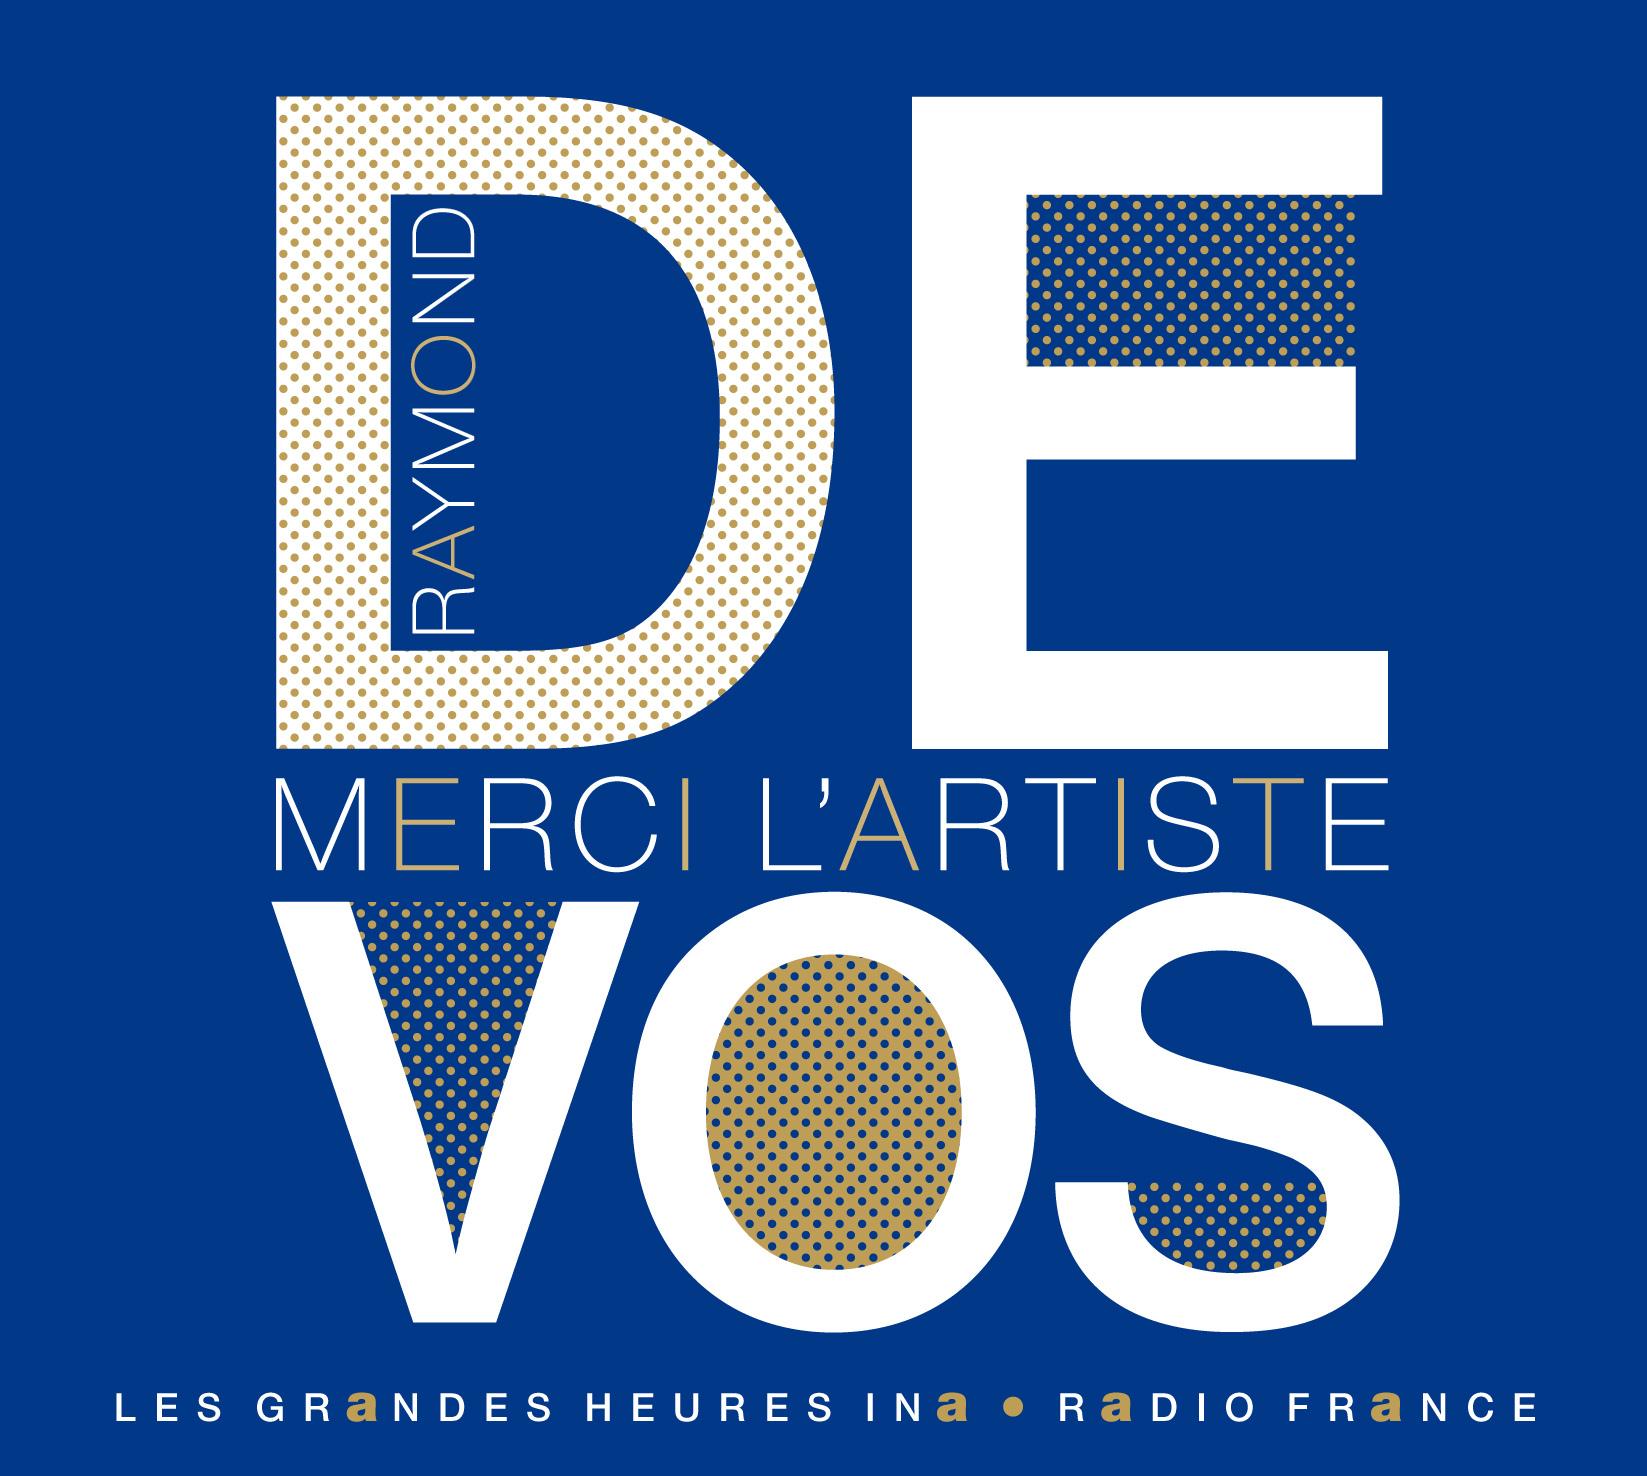 RAYMOND DEVOS, 1922-2016 - MERCI L'ARTISTE